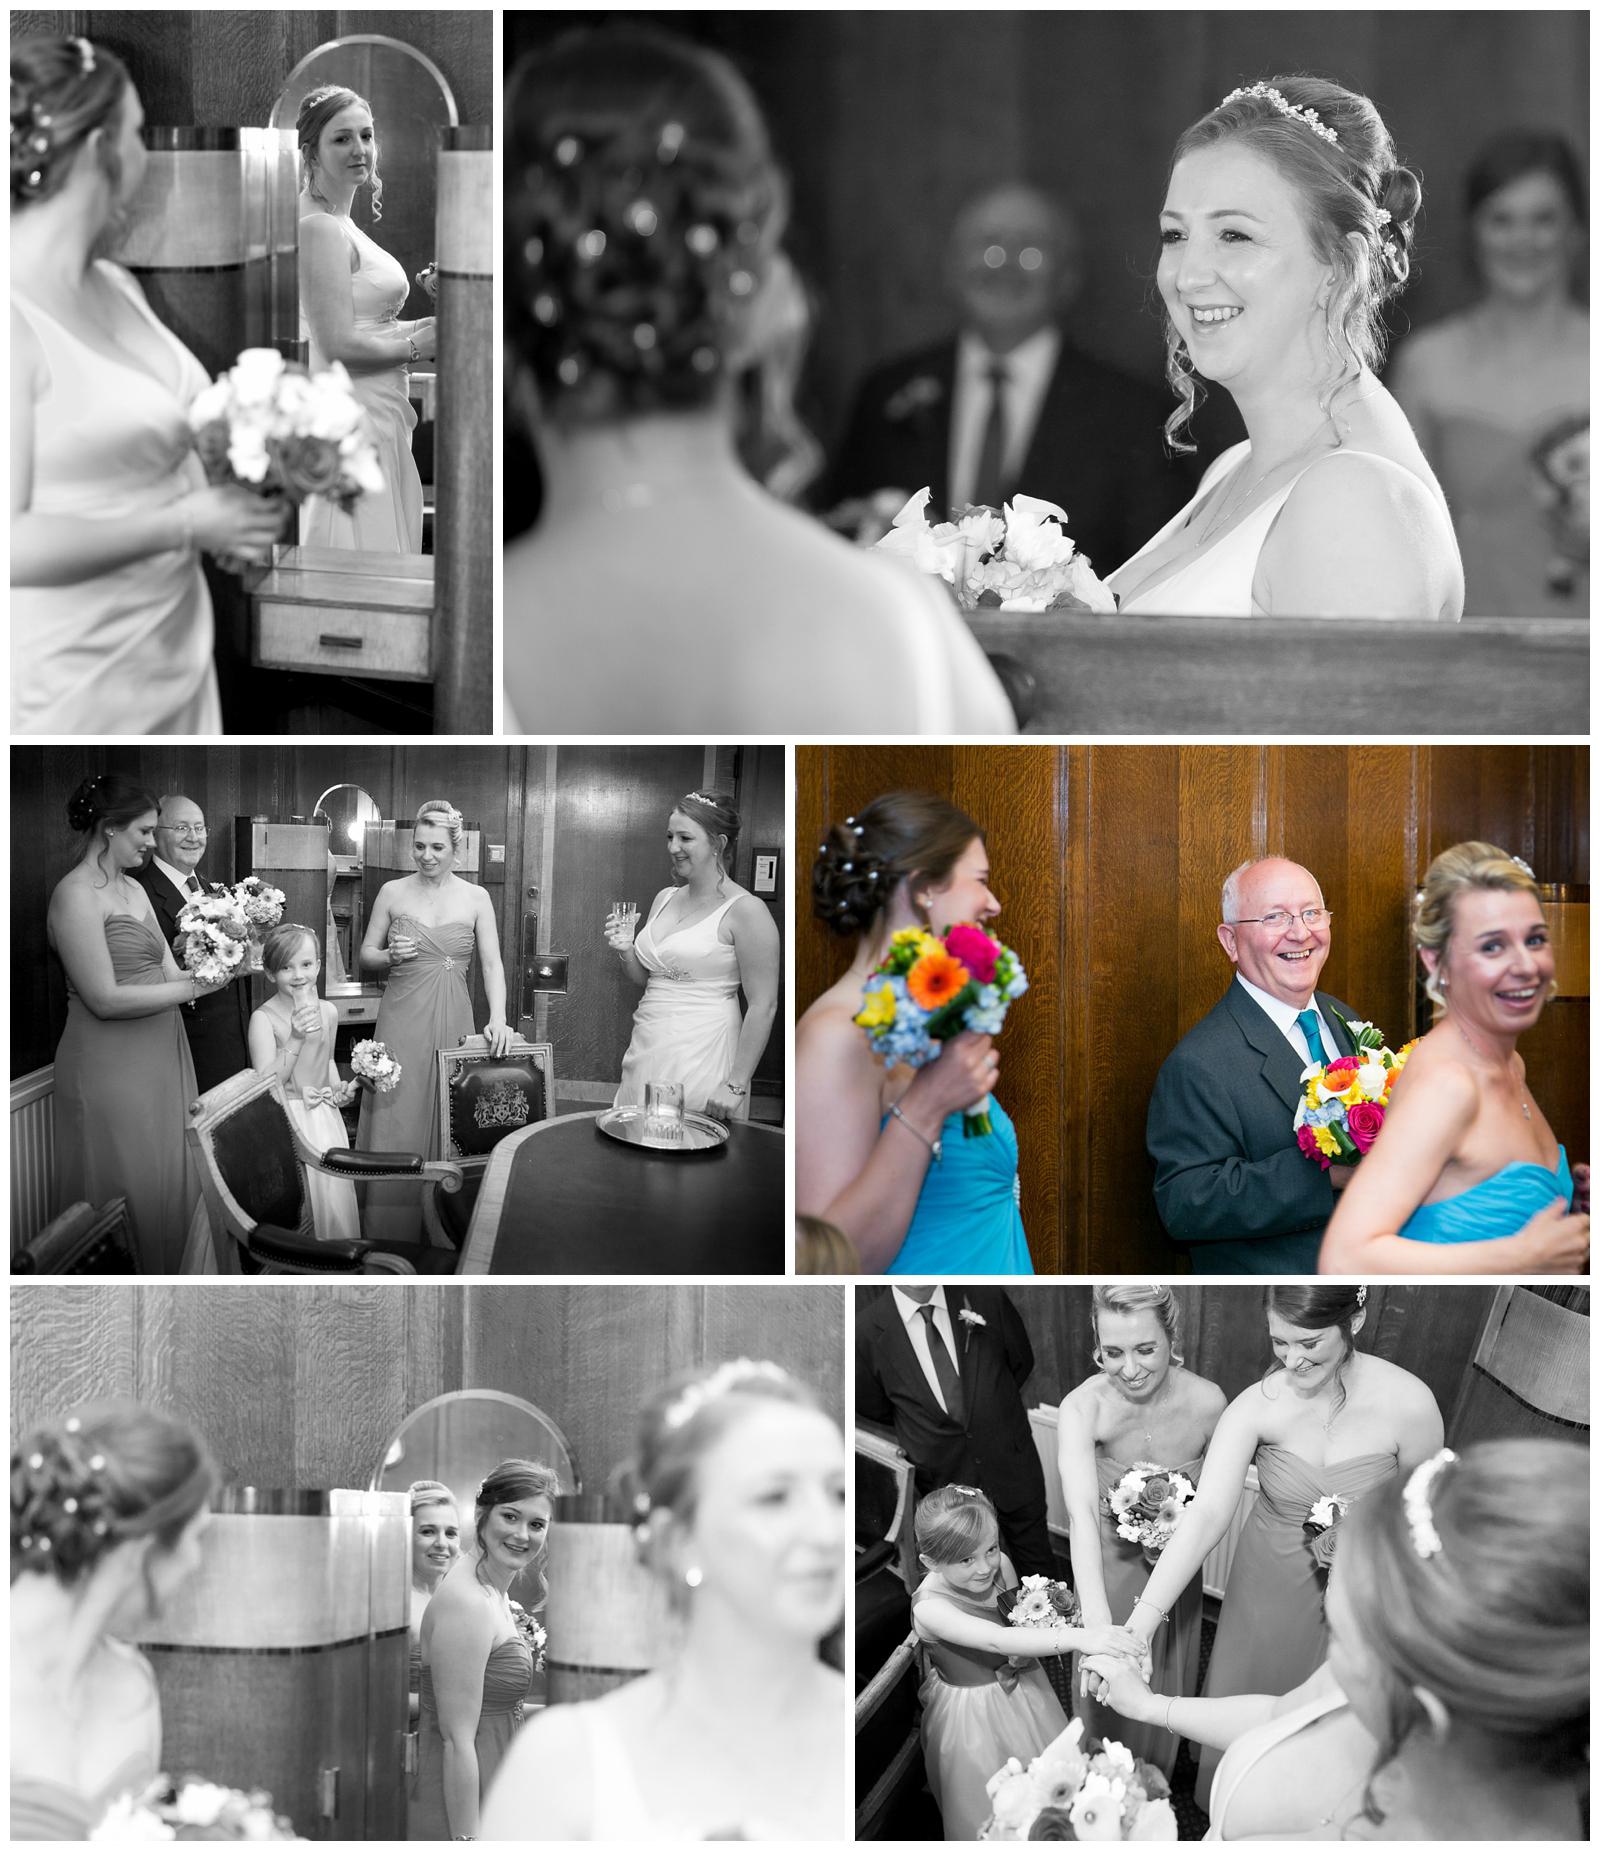 bridal-preparation-stockport-town-hall